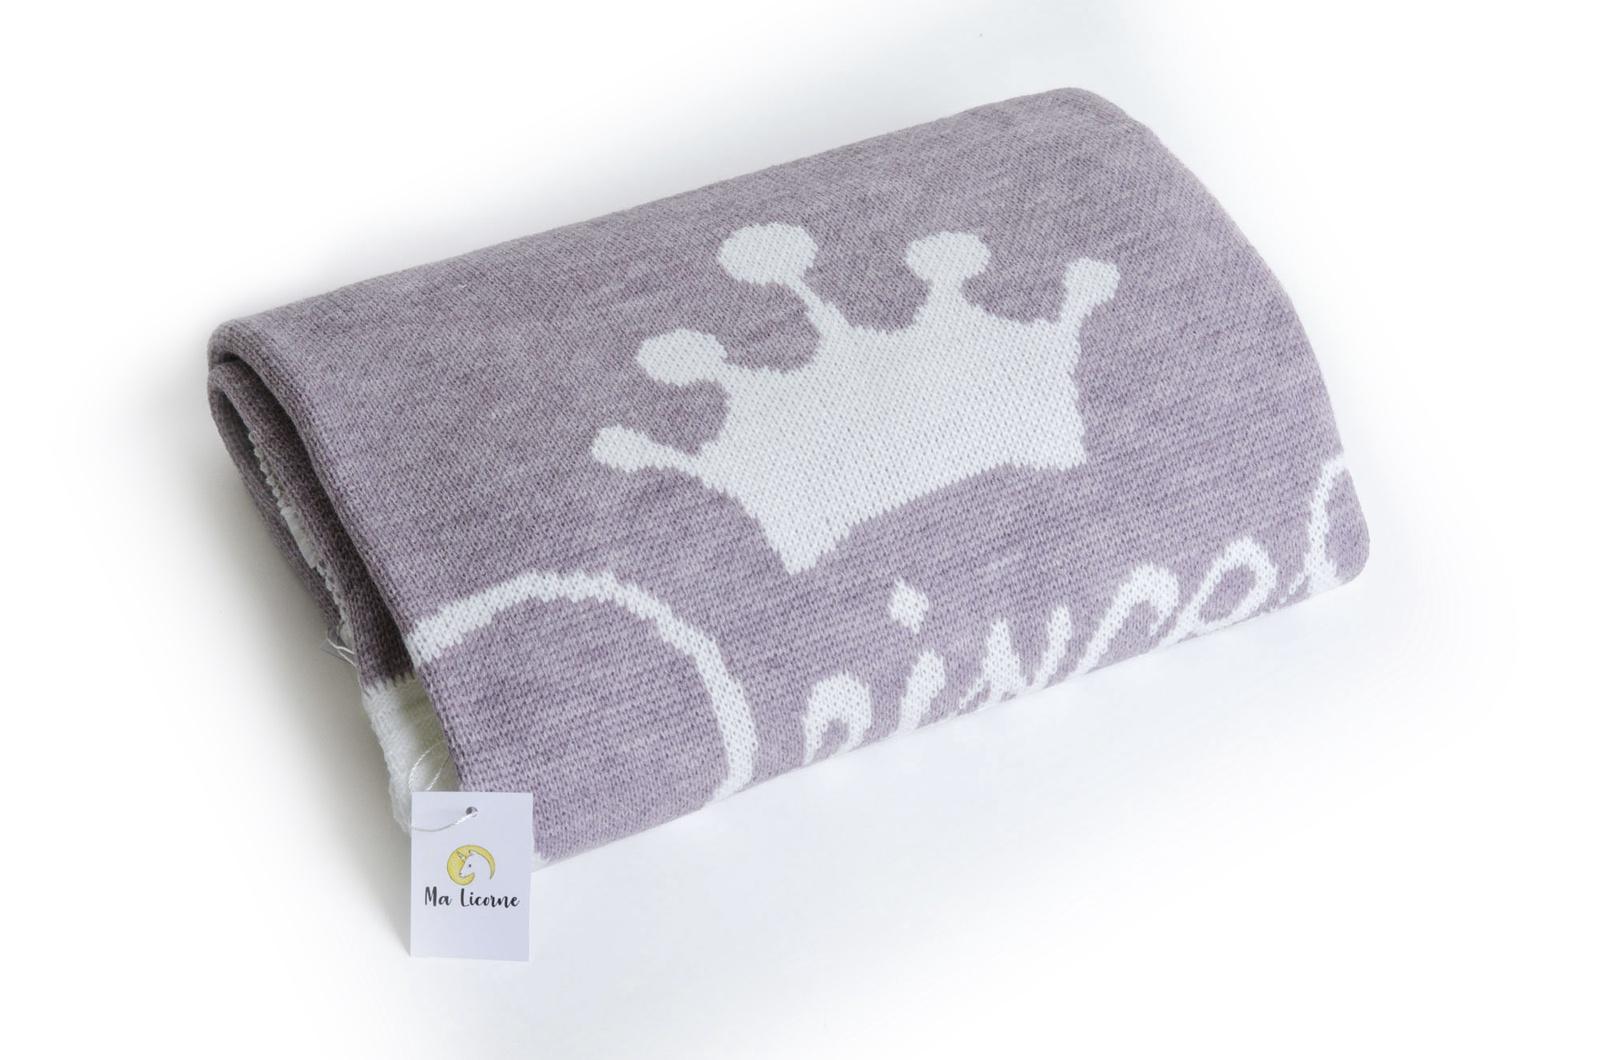 пледы Плед детский Ma Licorne Princesse violet (фиолетовый), 1х1 м